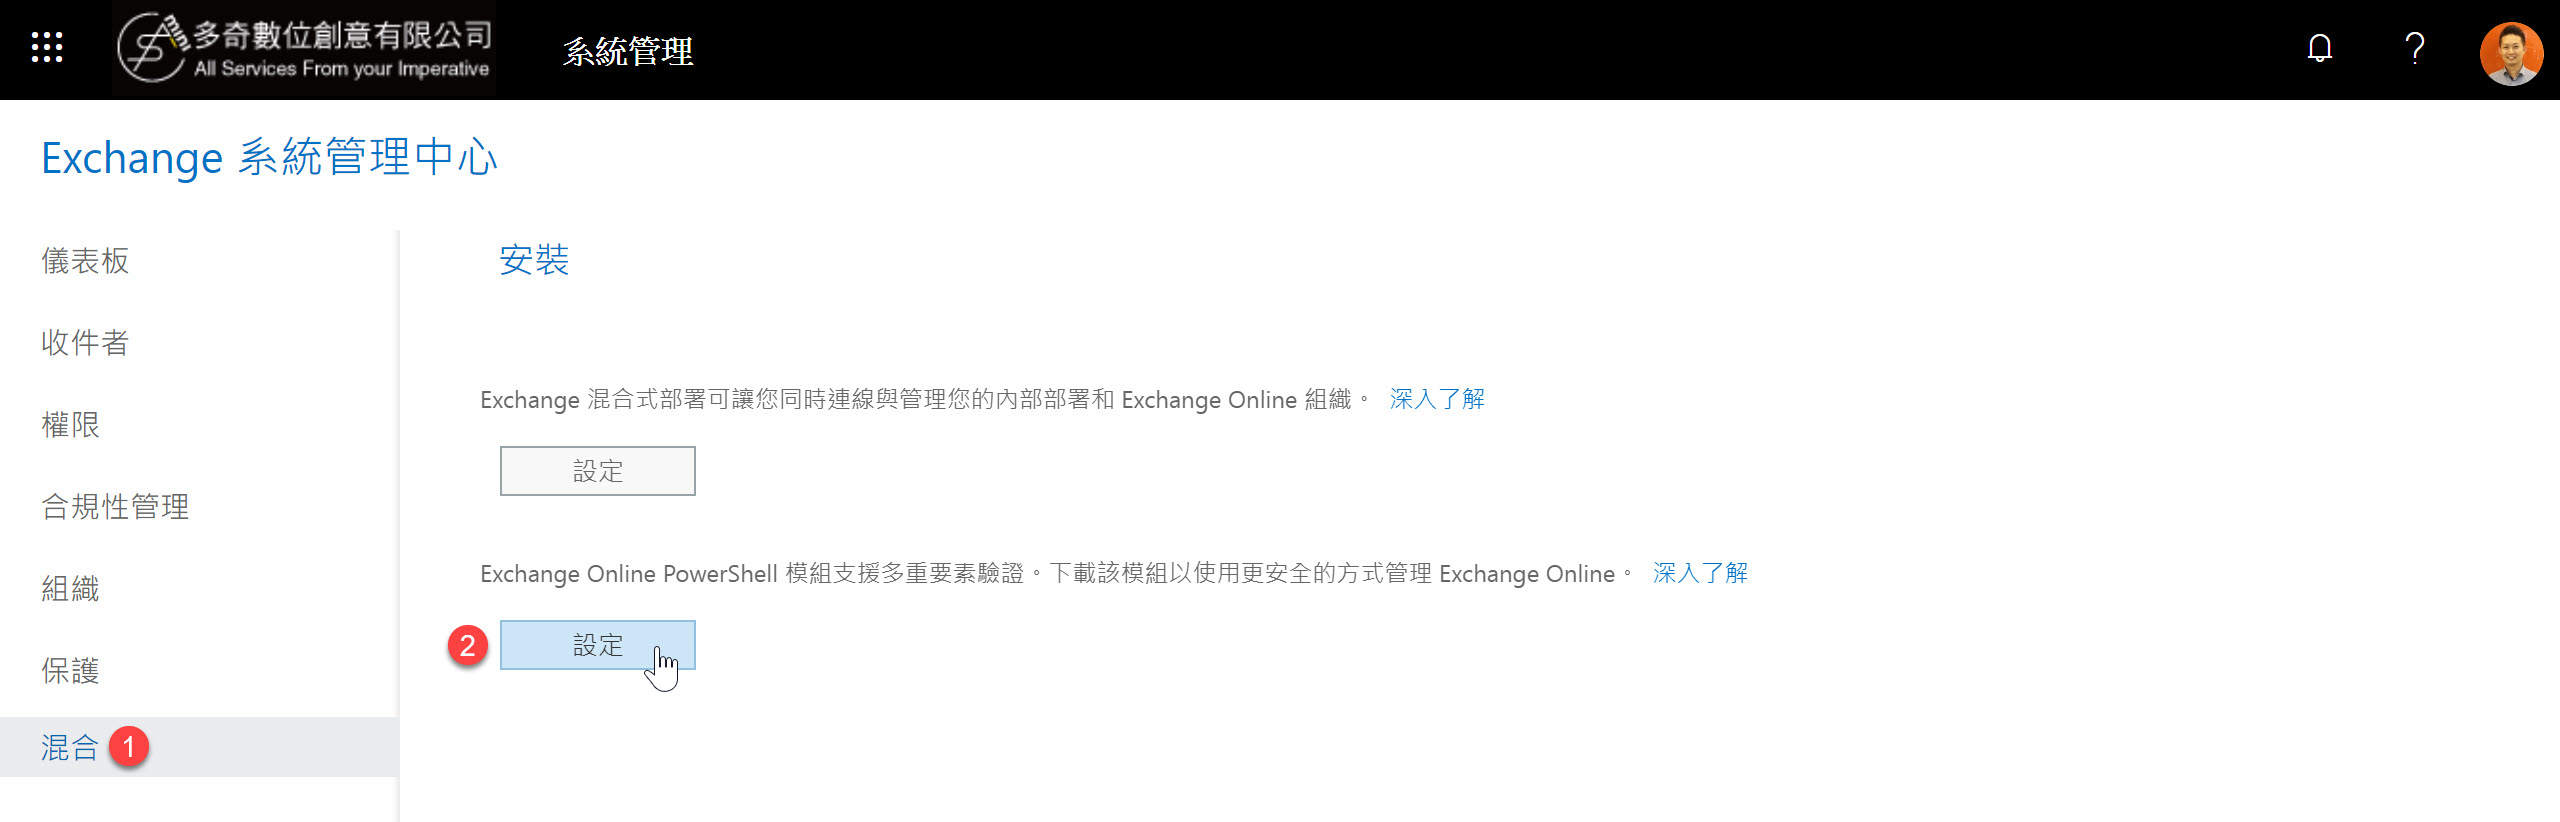 Exchange 系統管理中心 / 混合 / 安裝 / Exchange Online PowerShell 模組支援多重要素驗證。下載該模組以使用更安全的方式管理 Exchange Online。